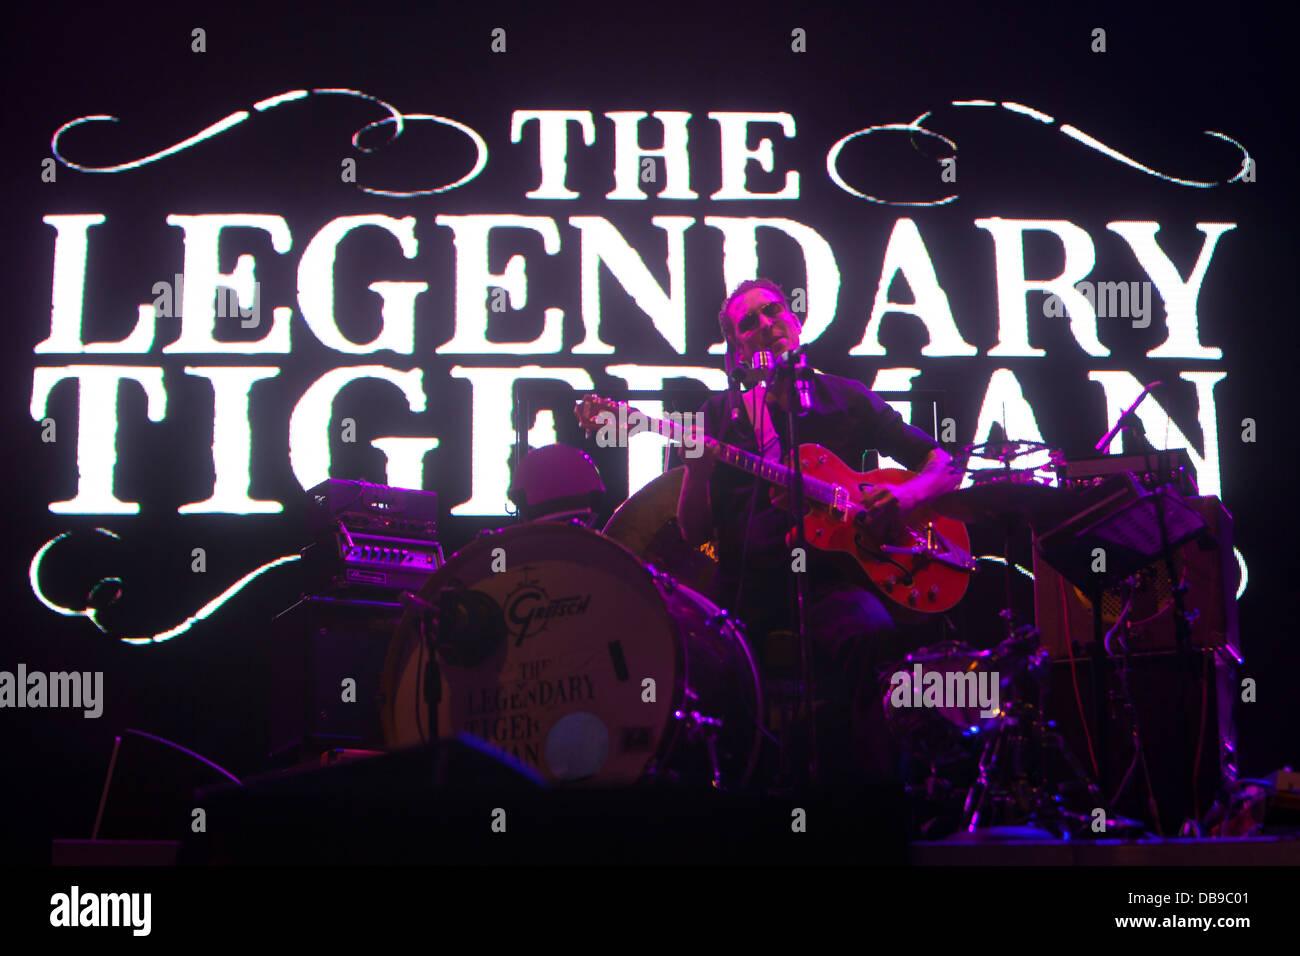 Die legendäre Tigerman beim Optimus Alive Festival 2013, Lissabon, Portugal. Stockbild